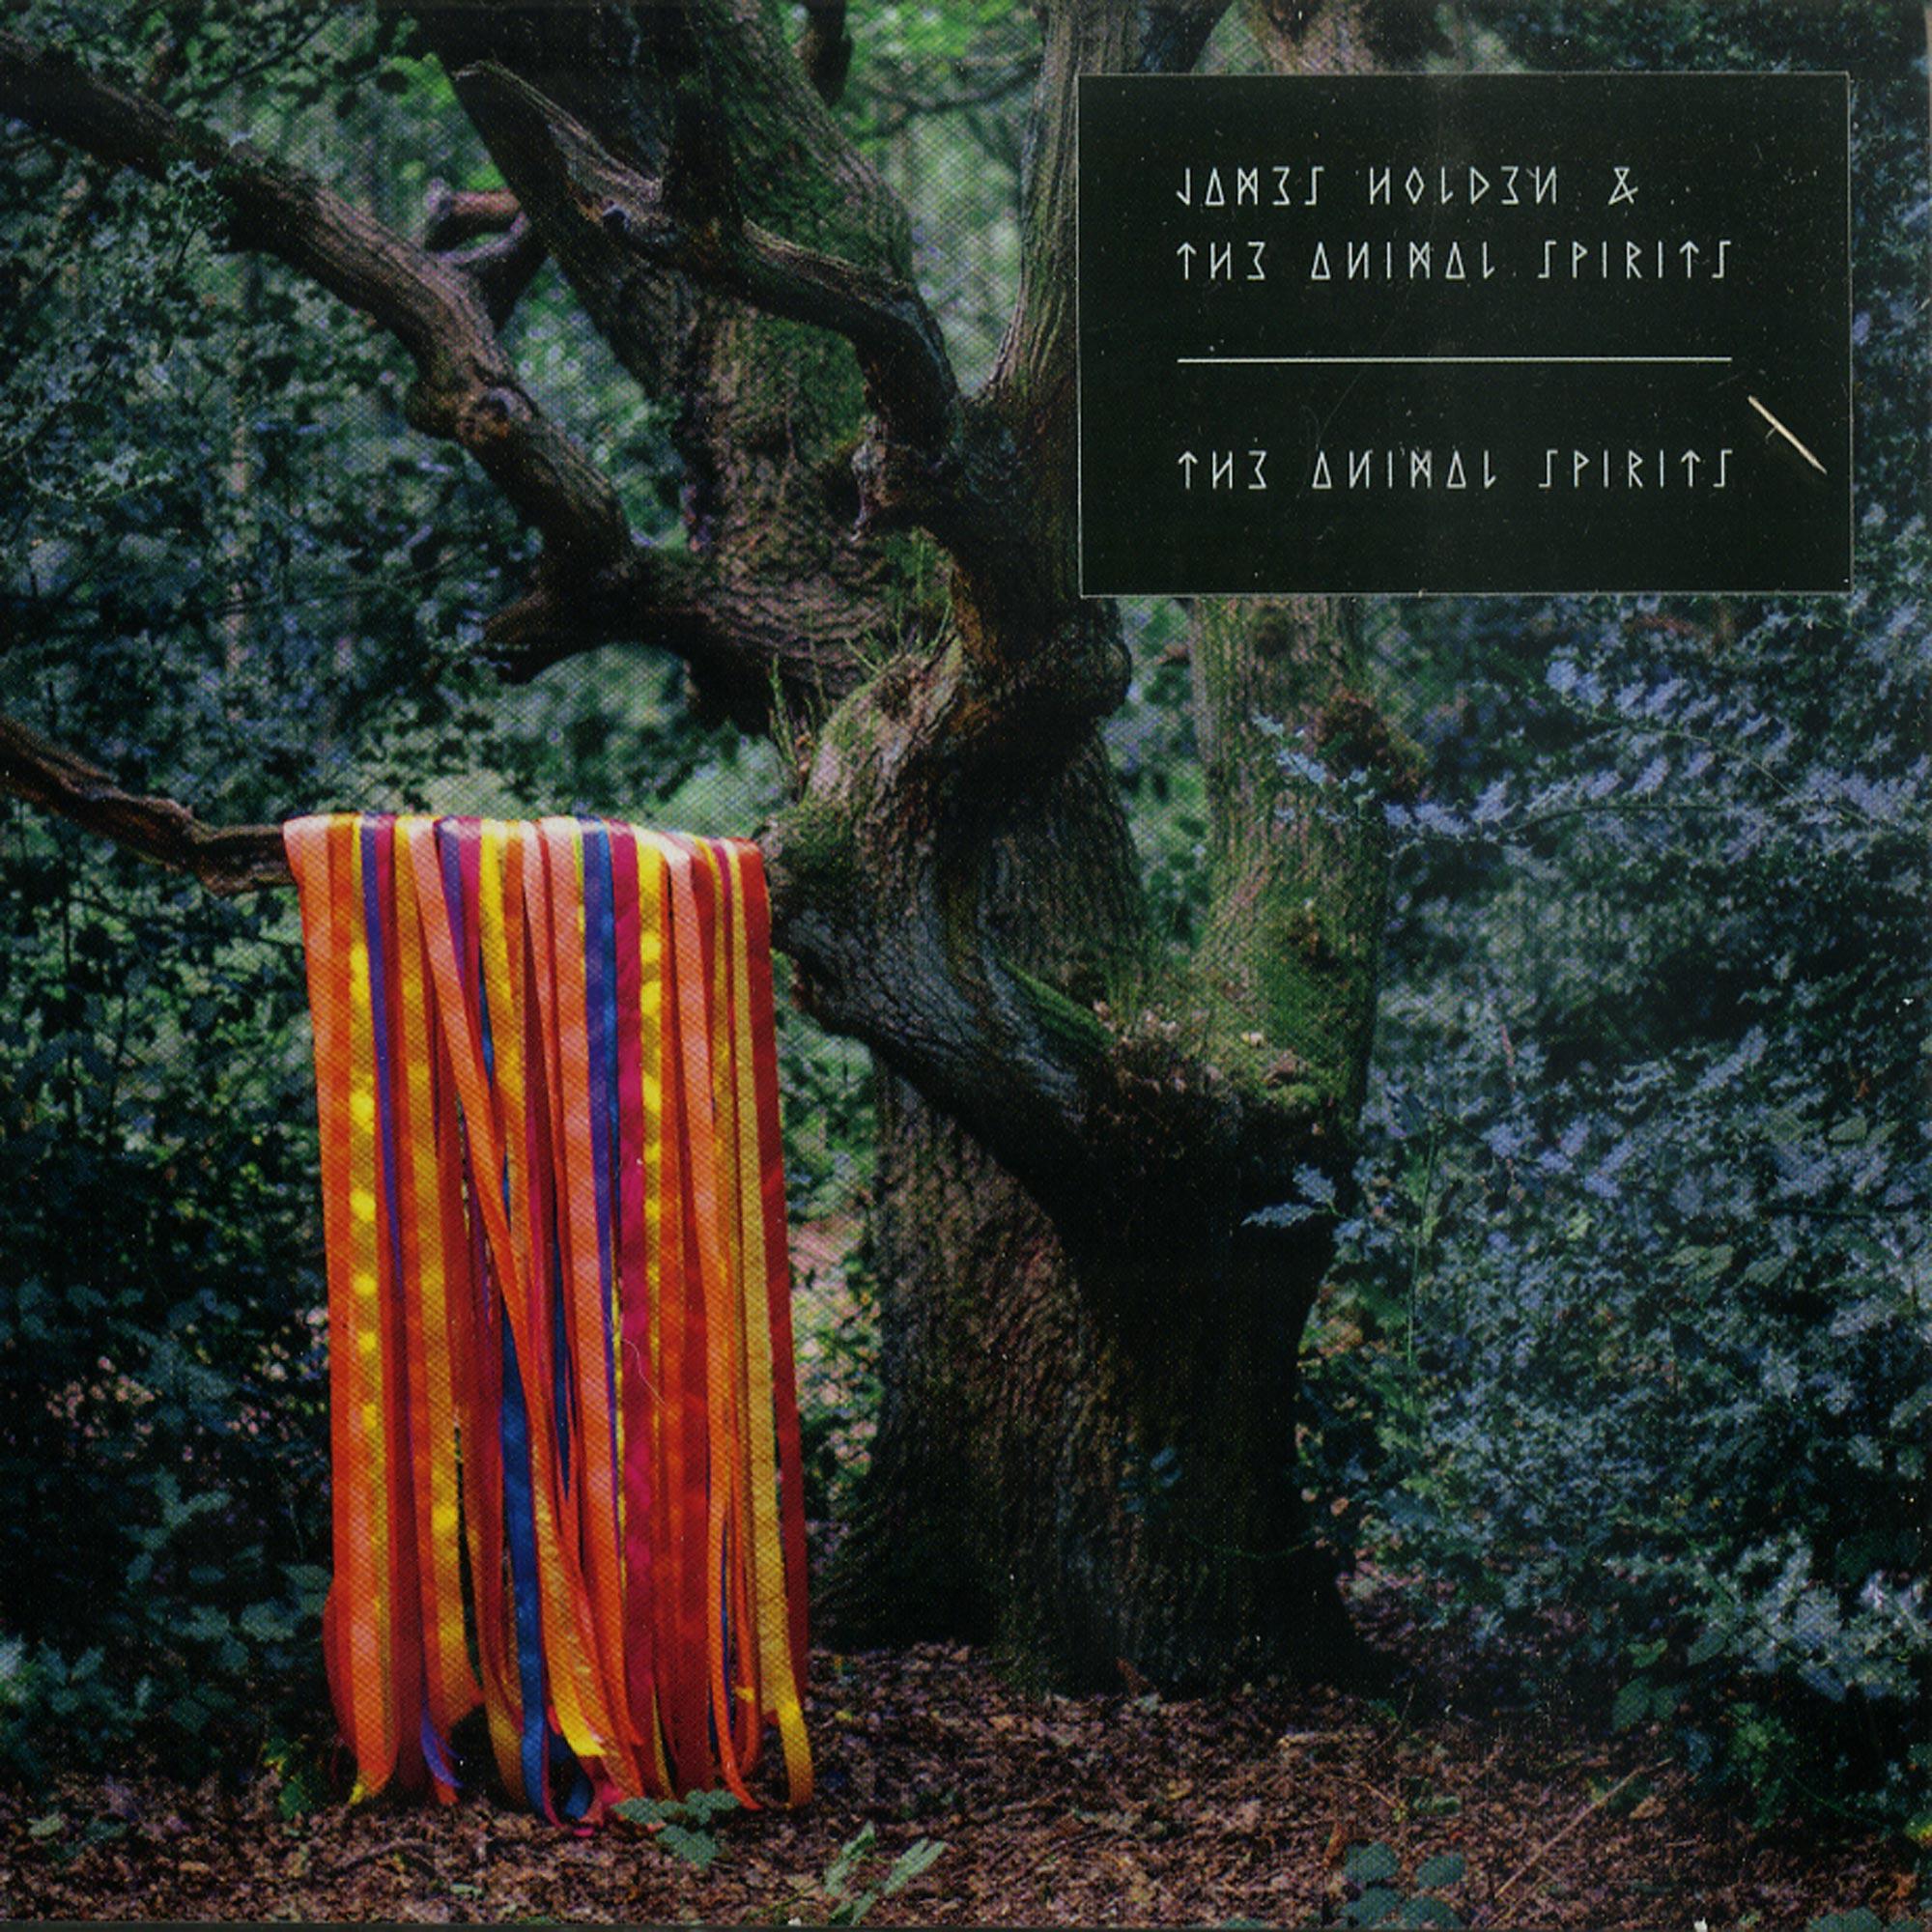 James Holden & The Animal Spirits - THE ANIMAL SPIRITS